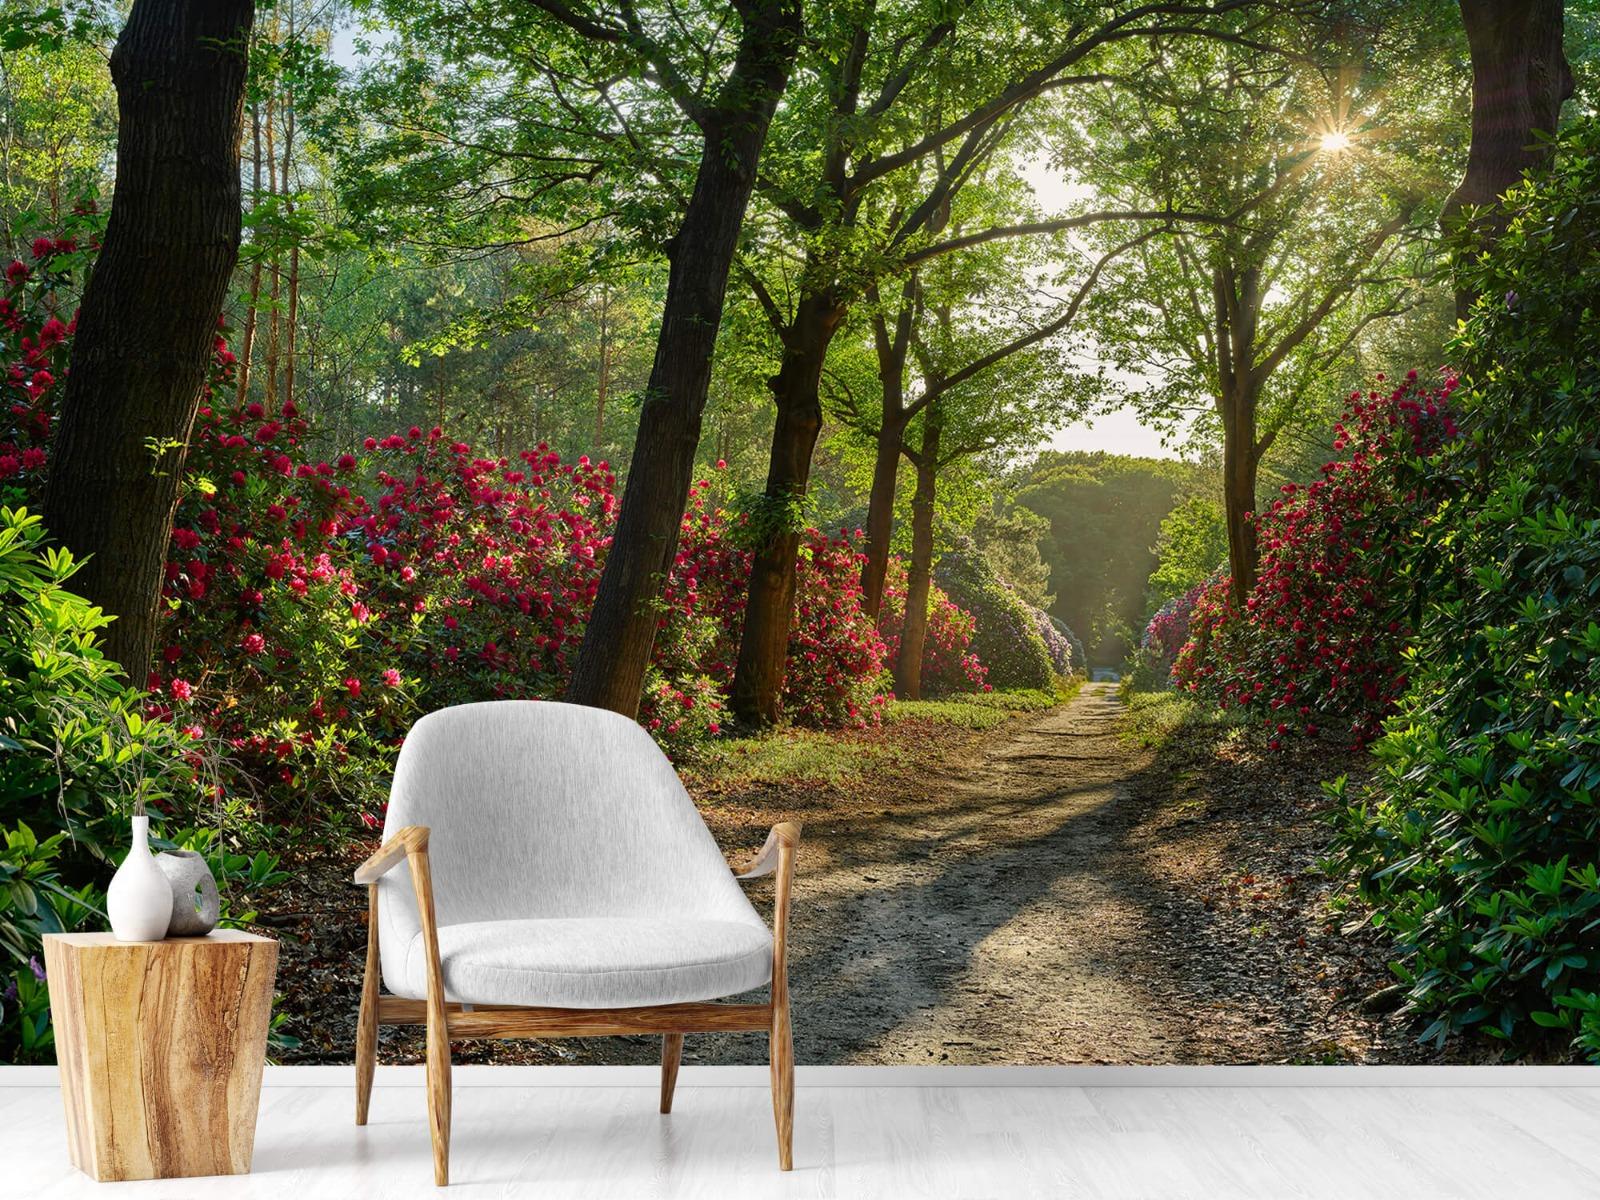 Bos - Zonsopkomst bij pad met rhododendrons 18